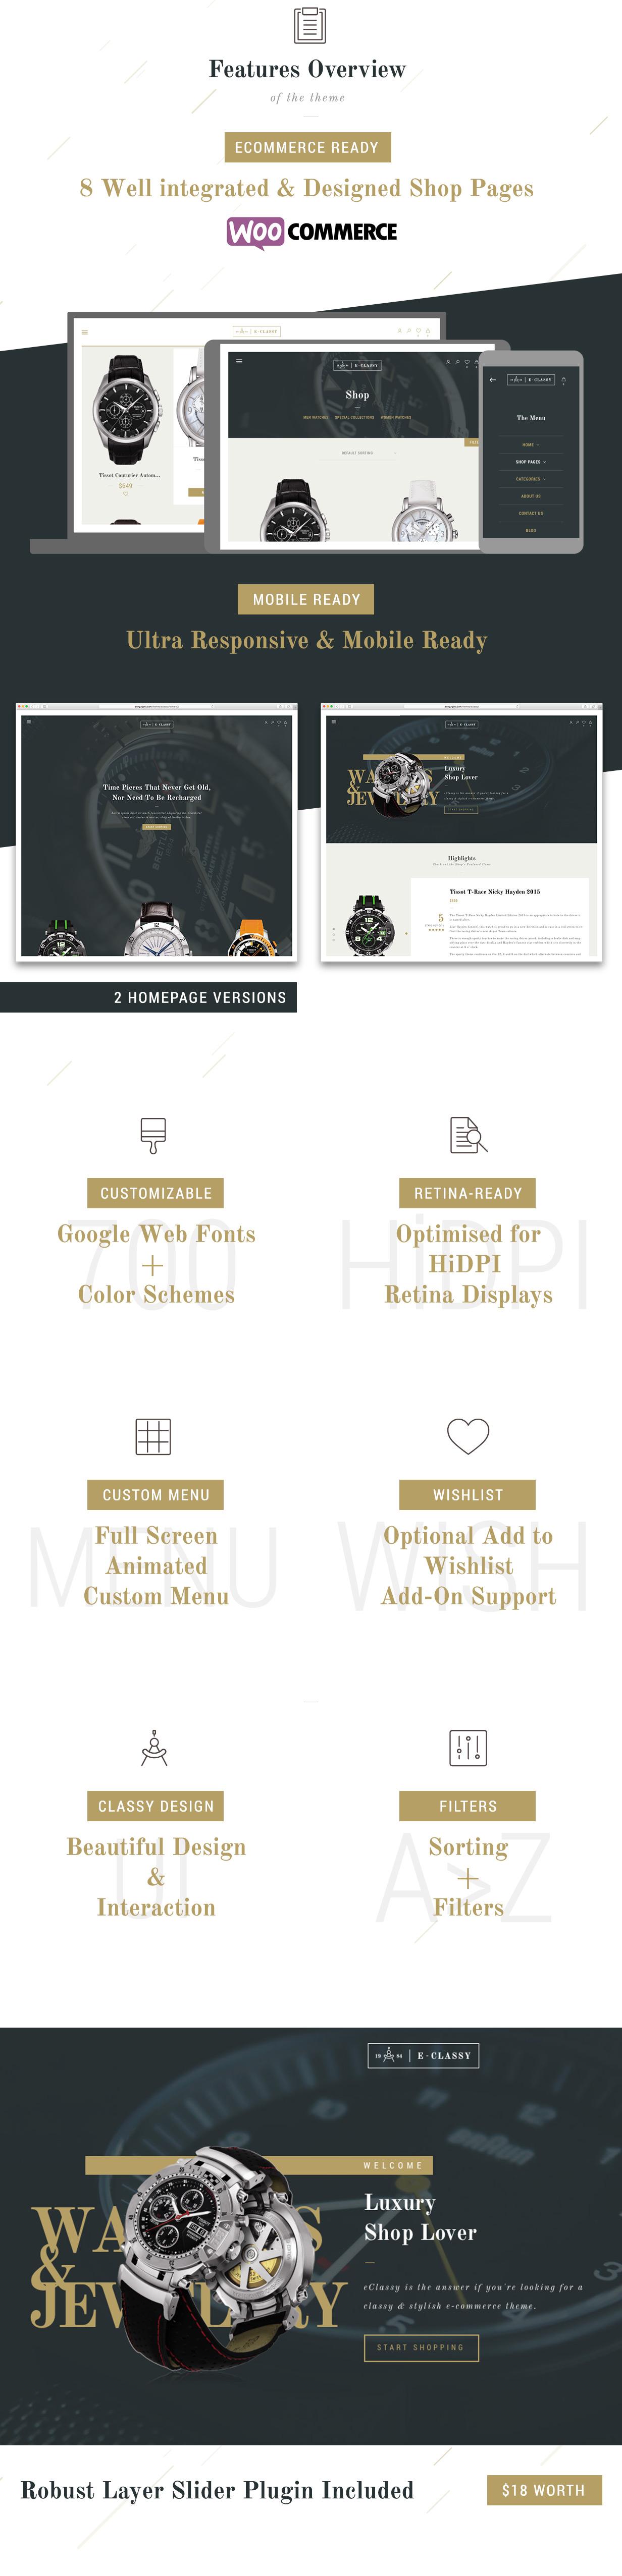 eClassy - eCommerce Classy Pro WordPress Theme - 1